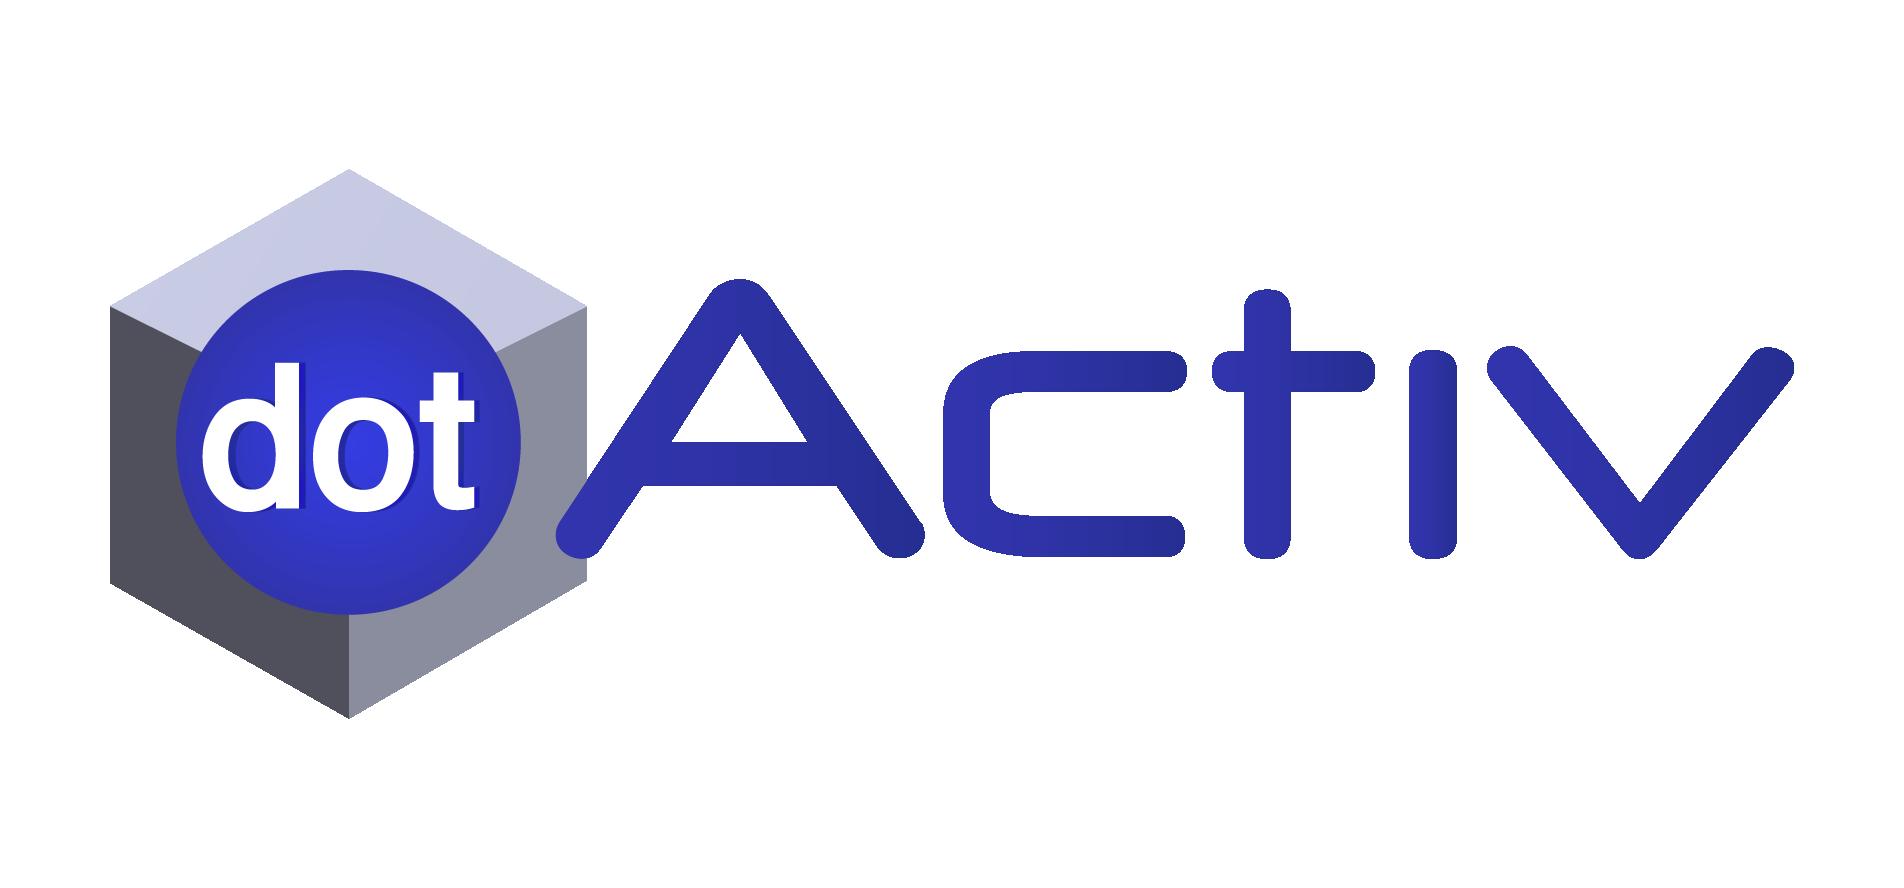 DotActiv